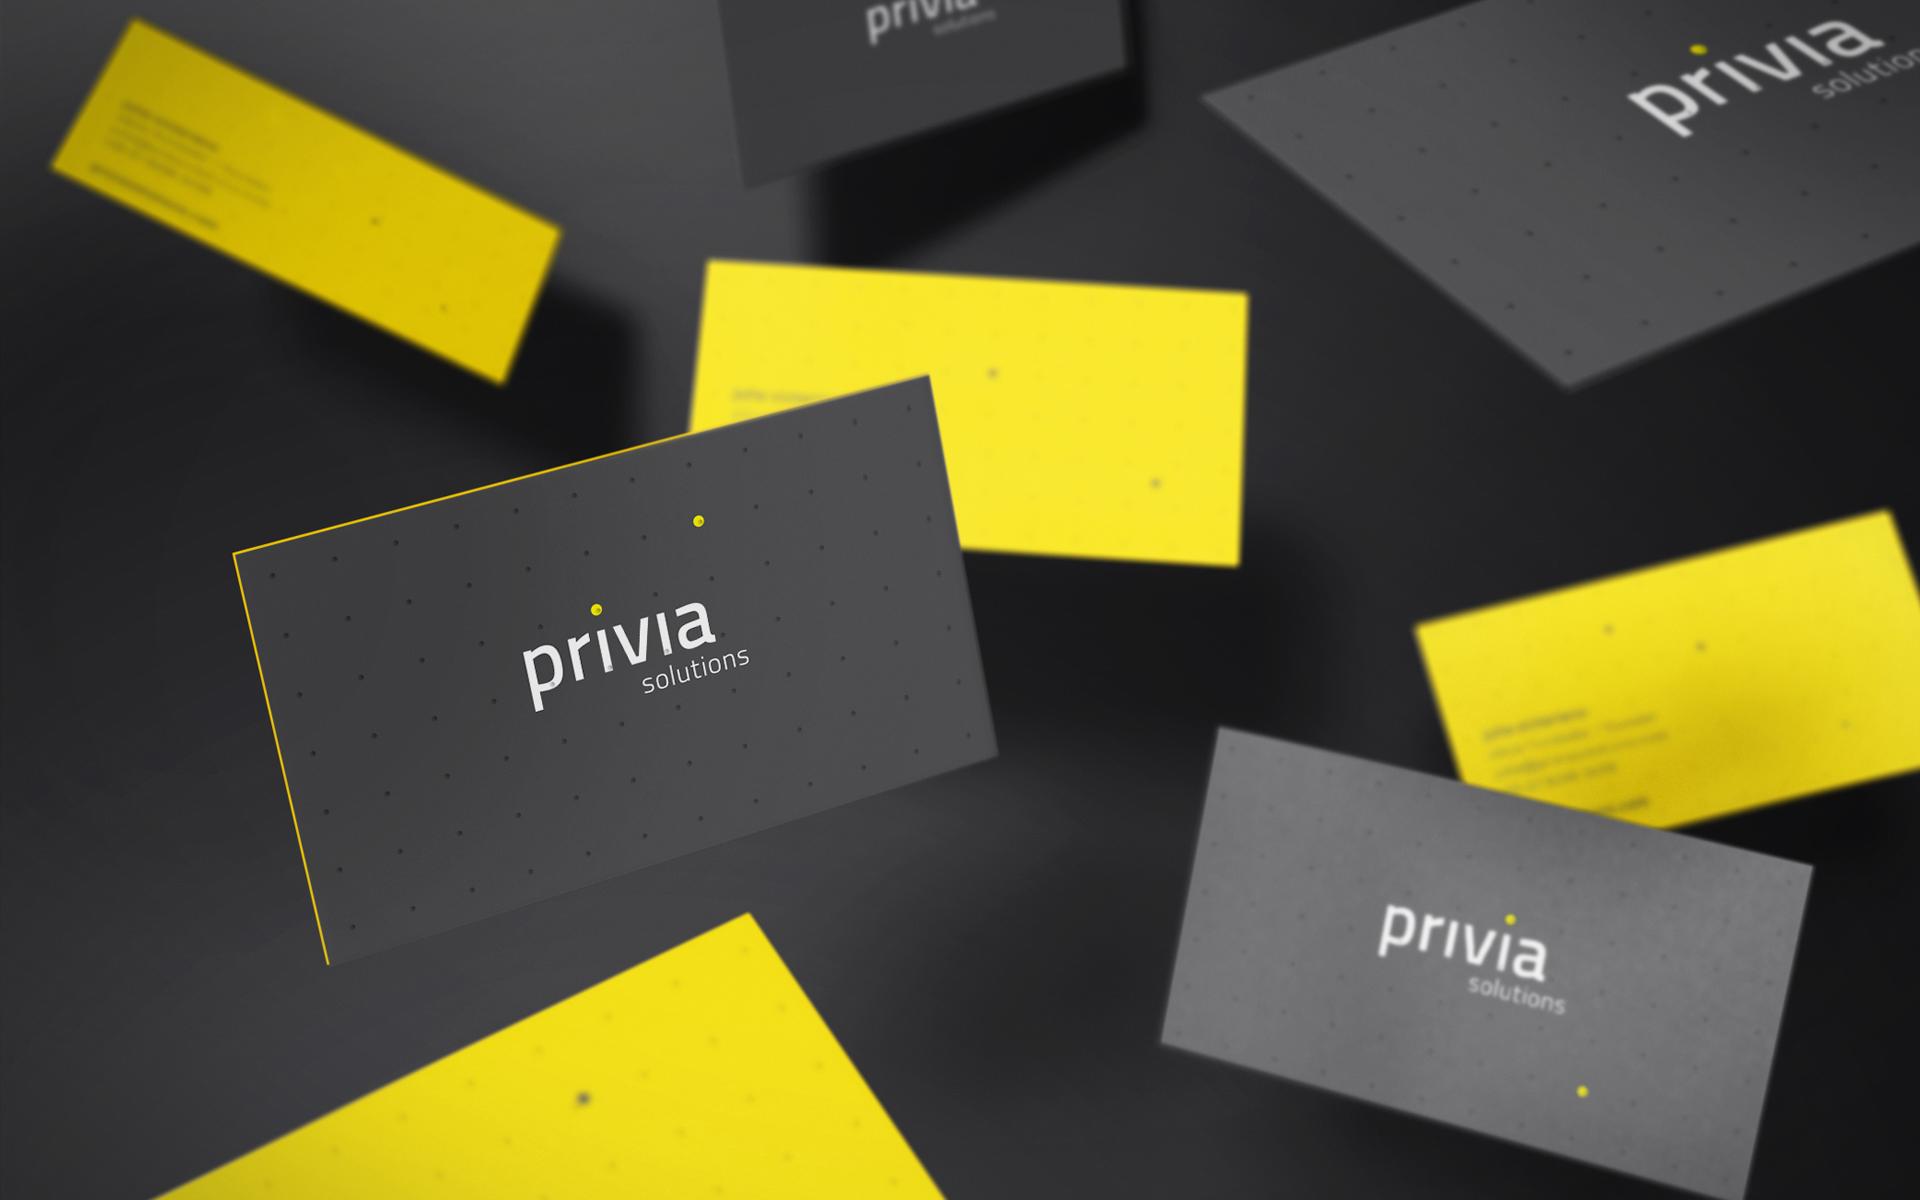 Case Privia Solutions Imagem 2